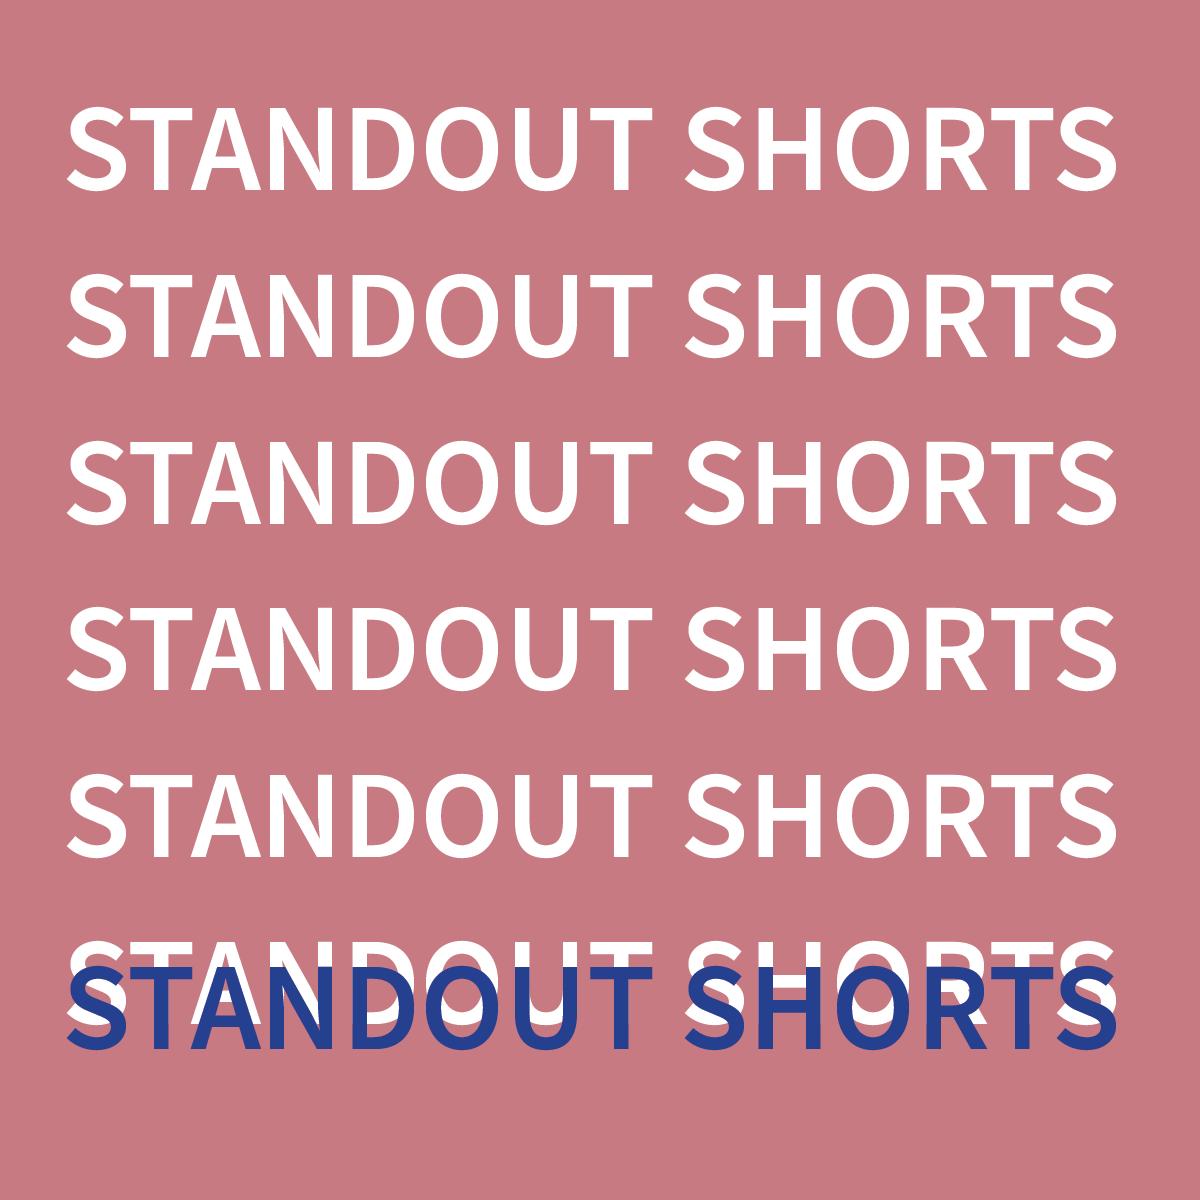 StandoutShorts_Tile.png